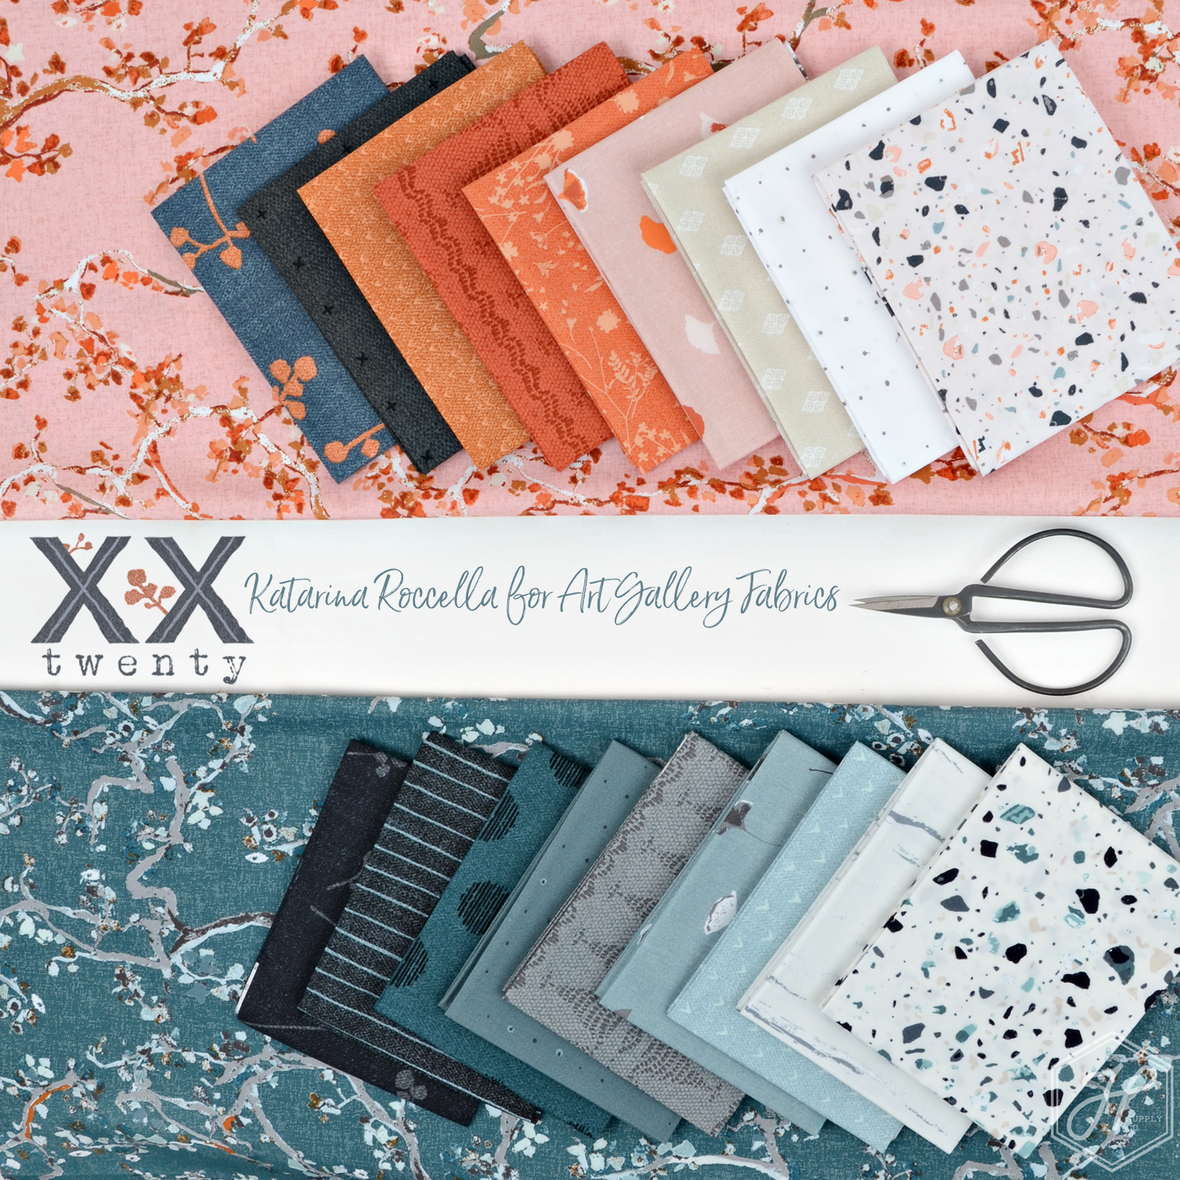 Twenty fabric Katarina Roccella for Art Gallery at Hawthorne Supply Co